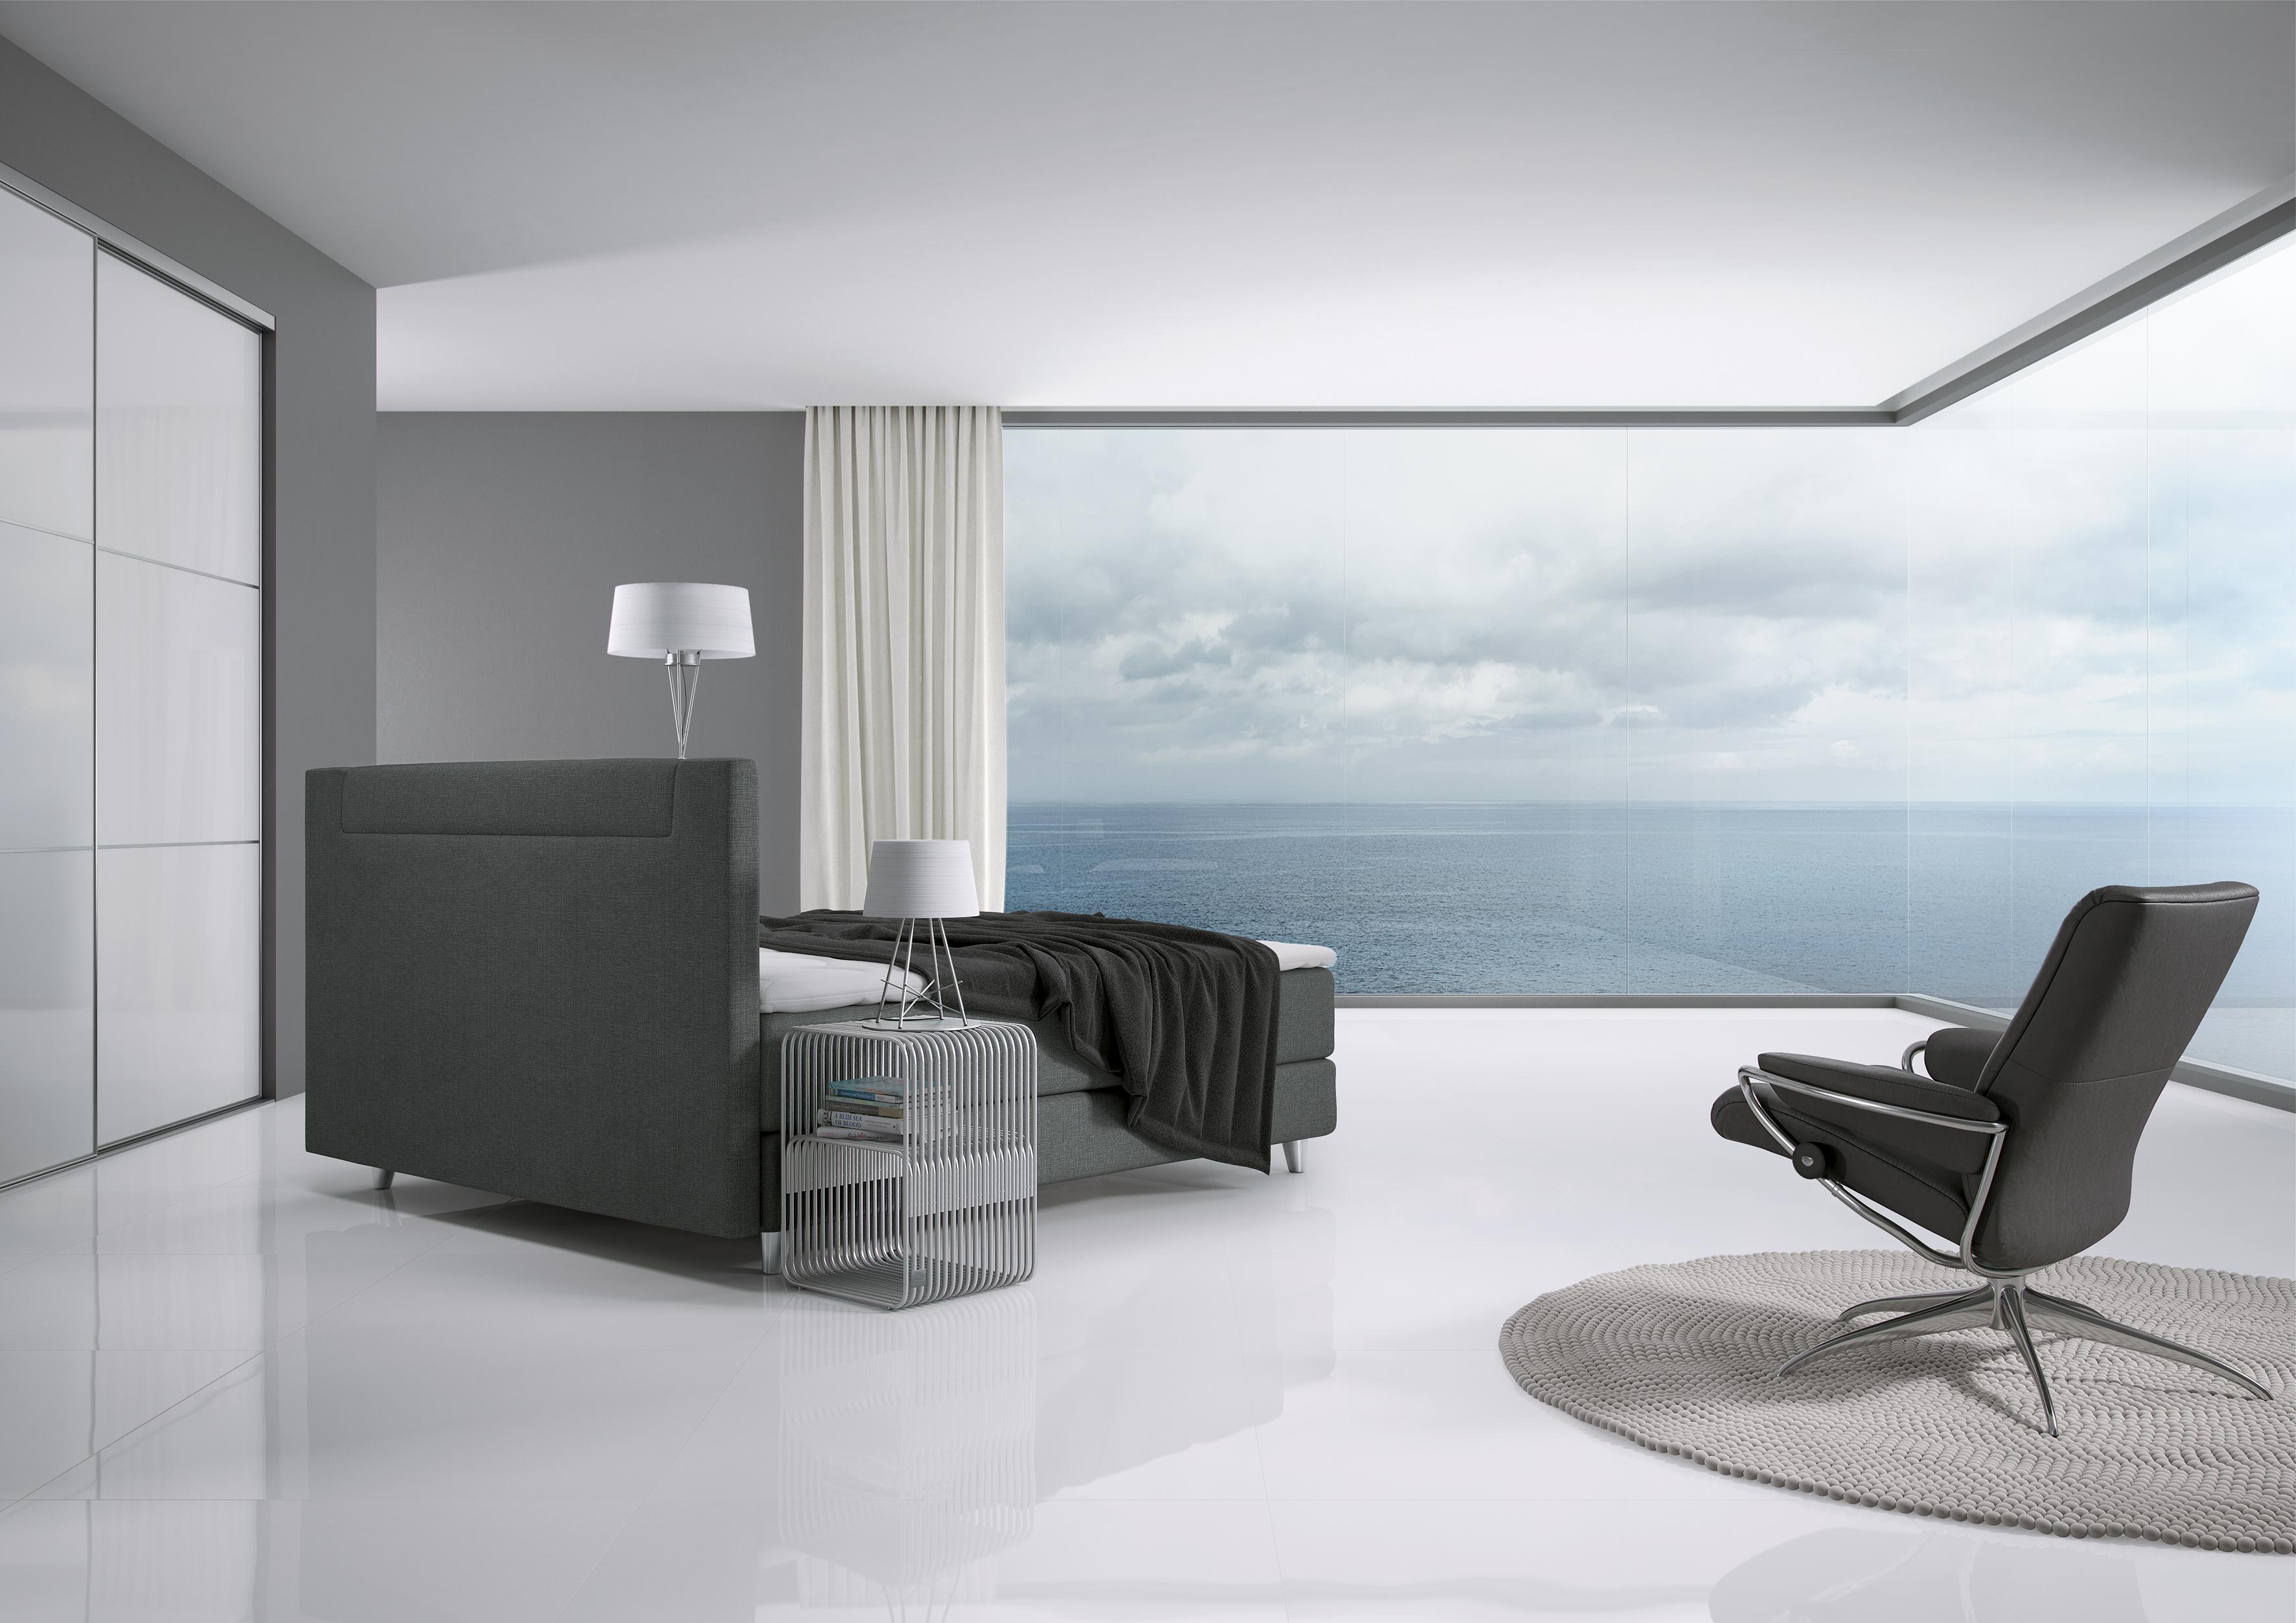 spannbettt cher f r boxspringbetten spannbettt cher f r jede matratzengr e g nstiges. Black Bedroom Furniture Sets. Home Design Ideas